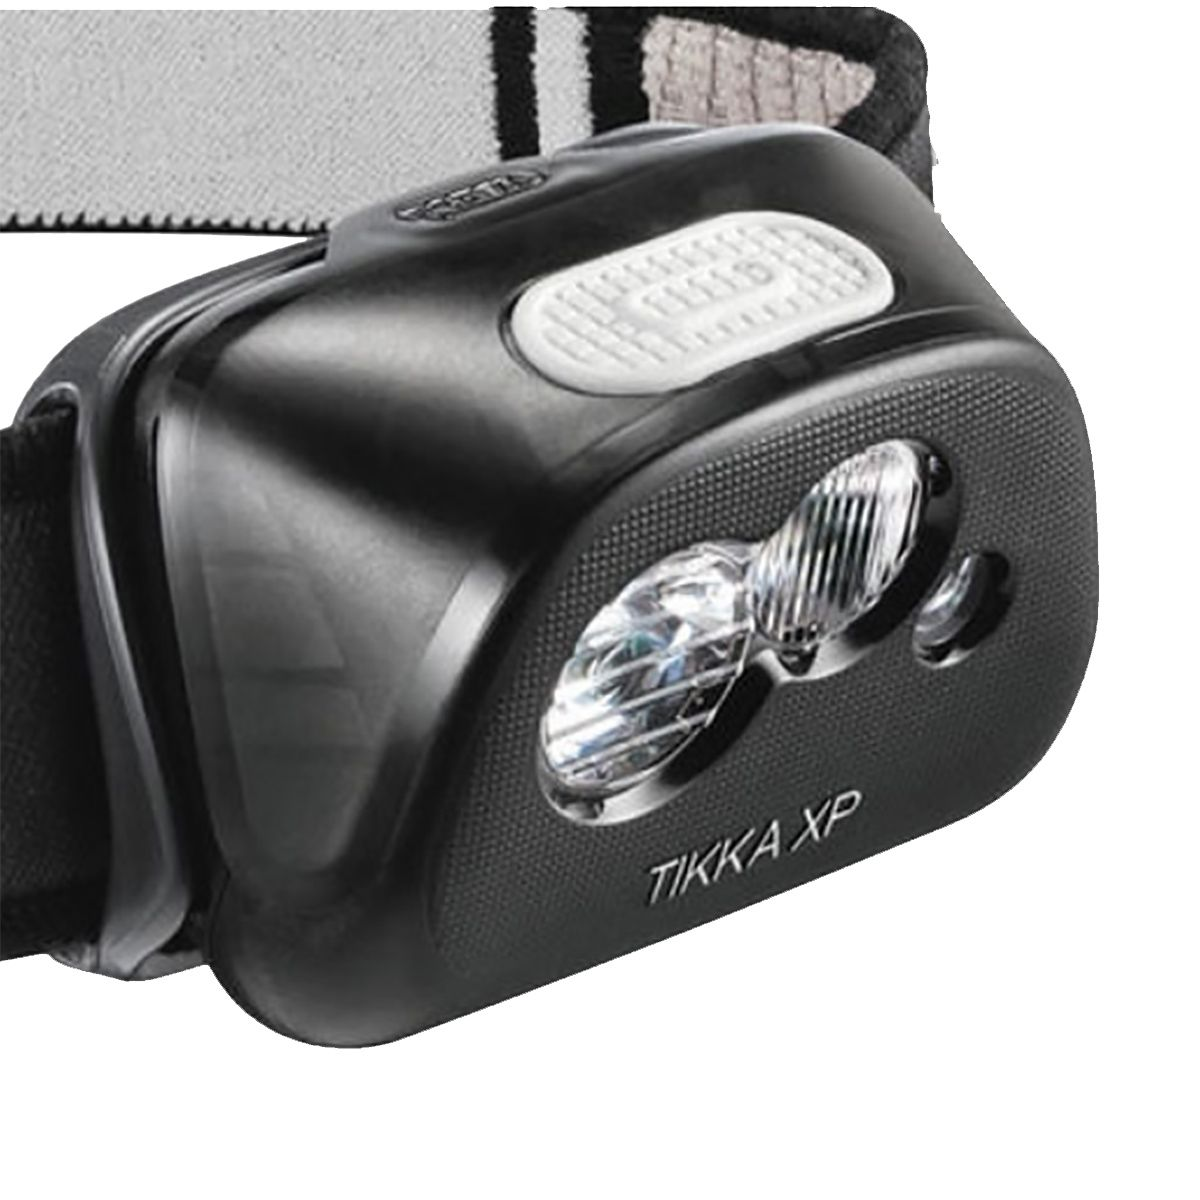 Lanterna de Cabeça TIKKA XP